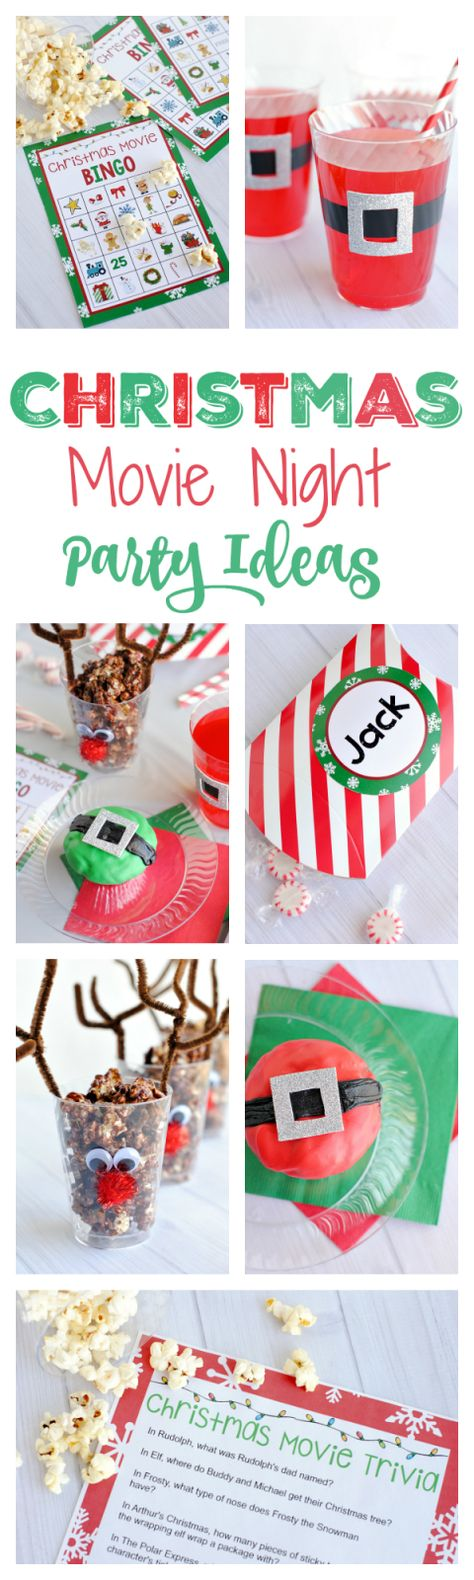 25 Days Of Christmas Ideas Bridget Crews S Collection Of 200 Christmas Fun Ideas